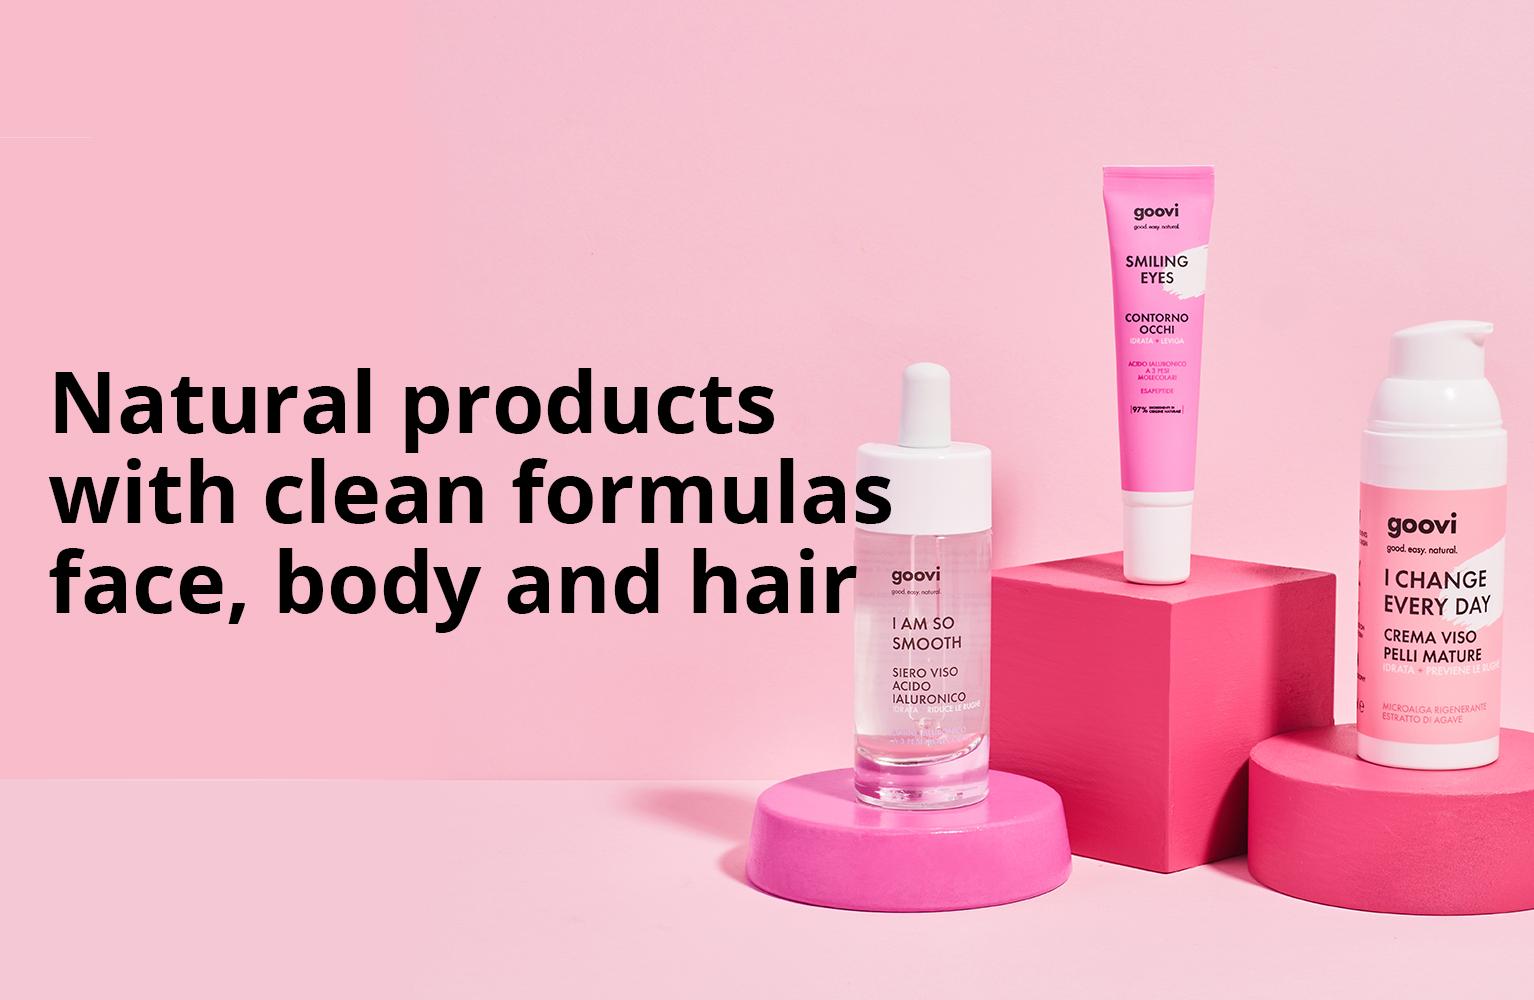 goovi natural cosmetic